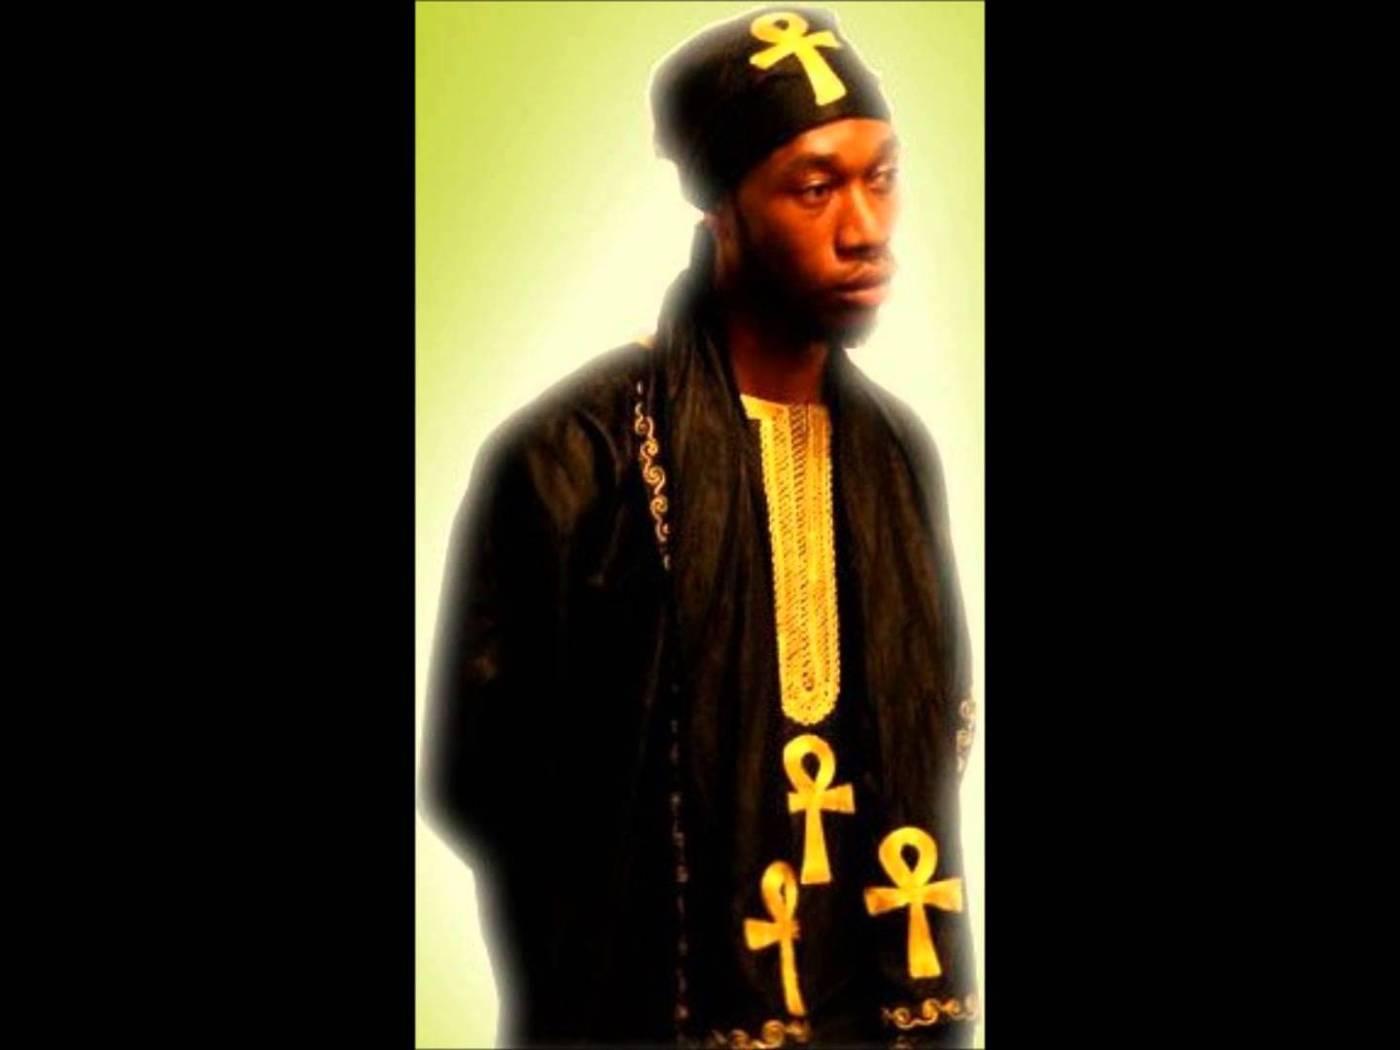 Brother P O L I G H T – Black Leadership Analysis